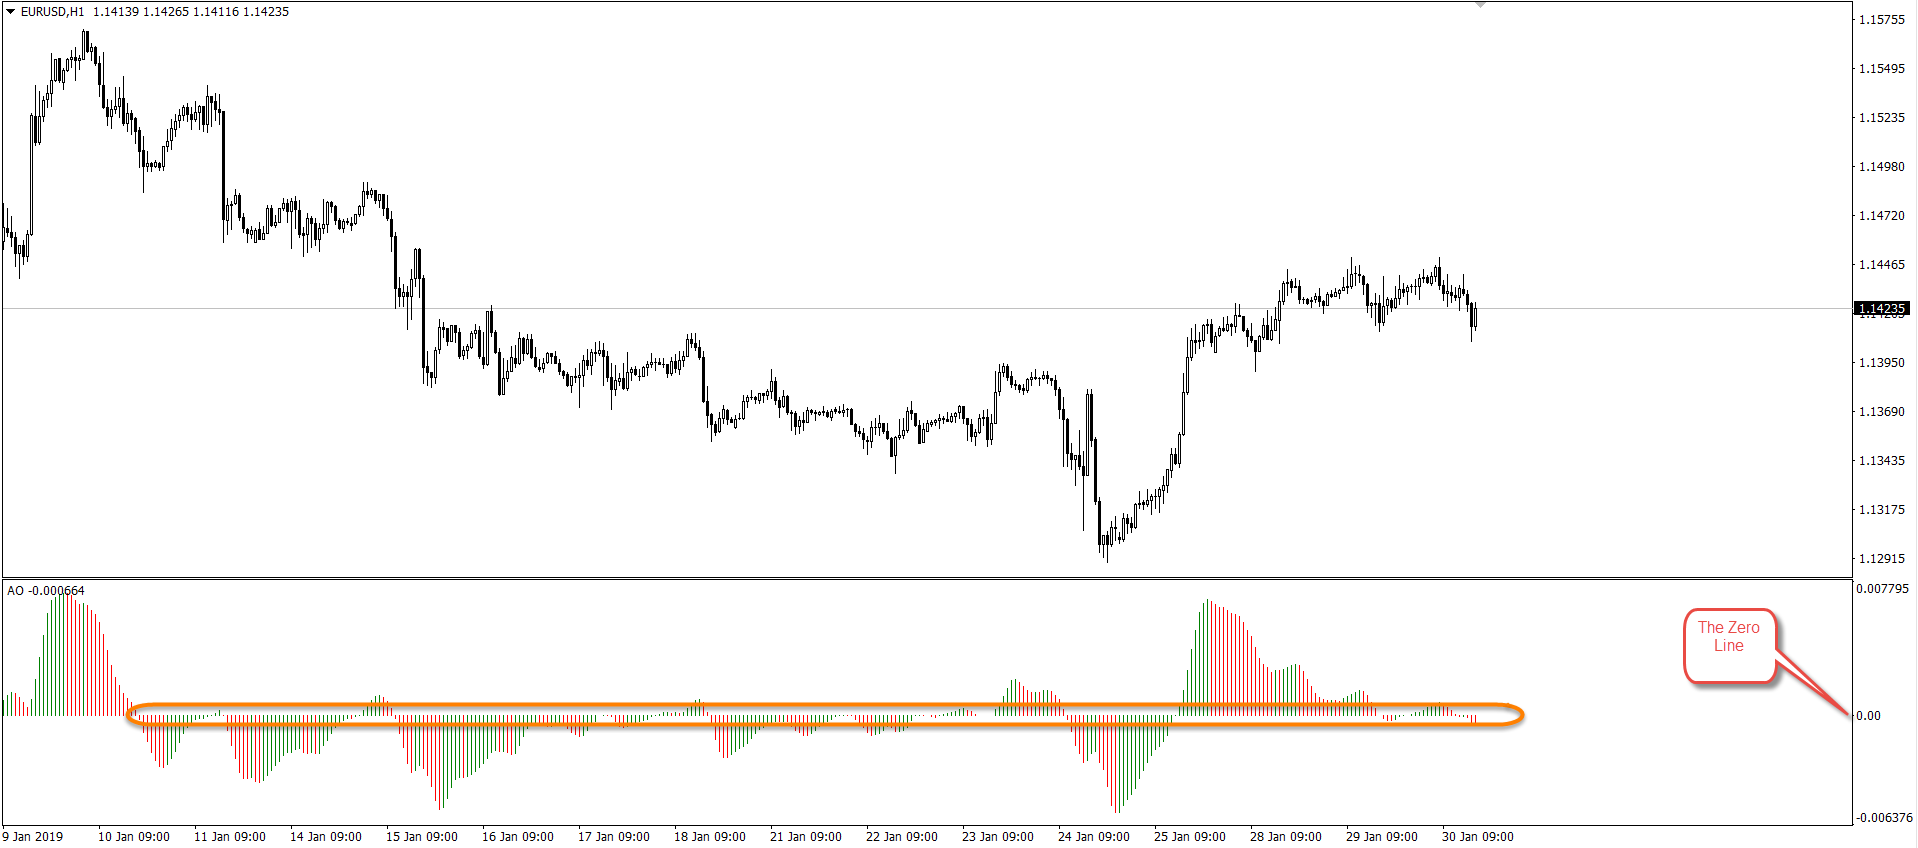 Measure Market Momentum Using the Awesome Oscillator 3